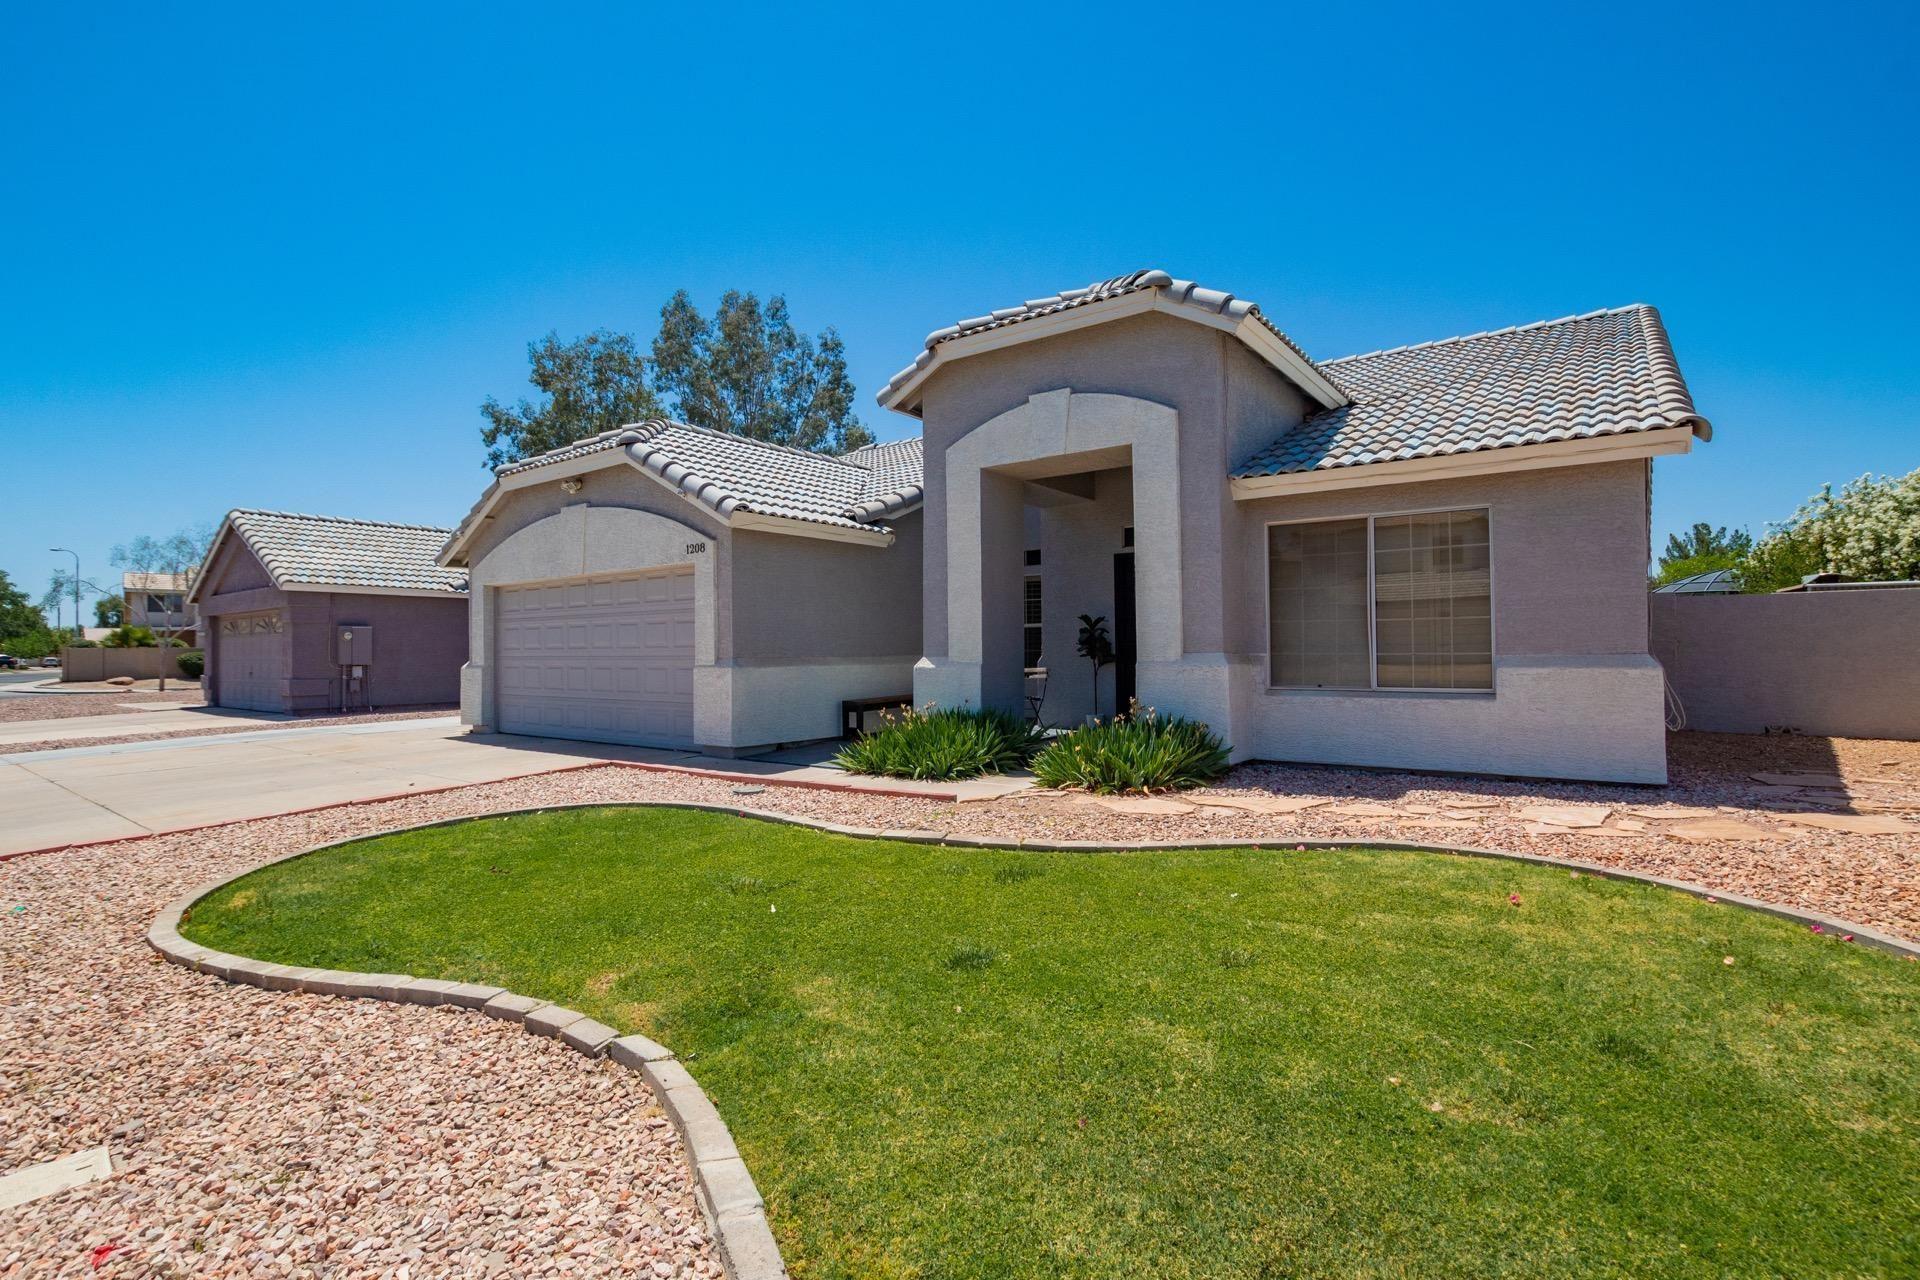 Photo of 1208 N NEWPORT Street, Chandler, AZ 85225 (MLS # 6233732)